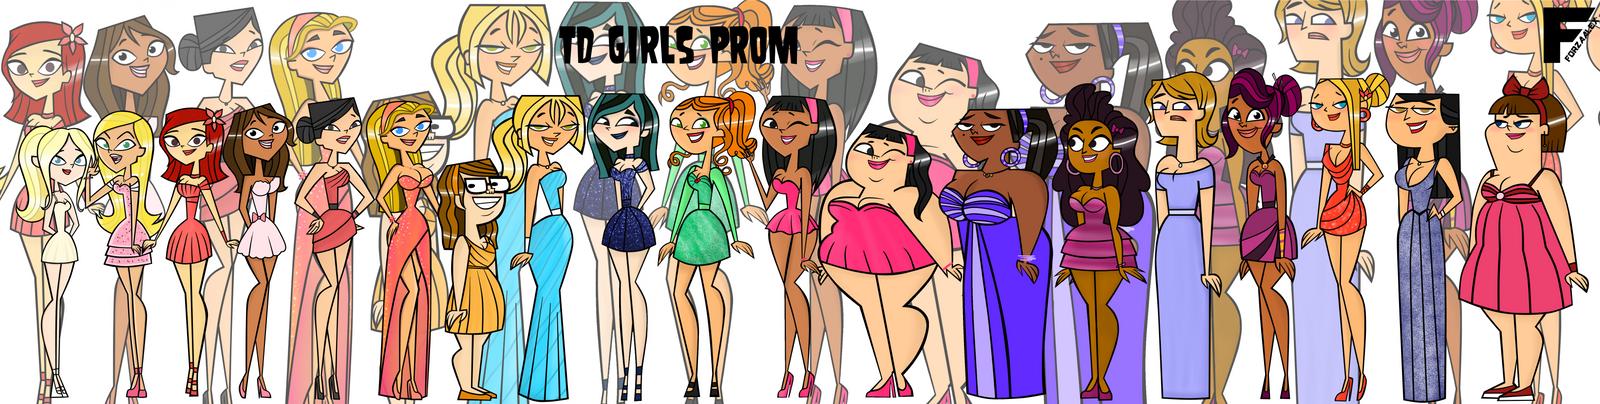 td girls prom   forzaalex 1 by prince vampire on deviantart